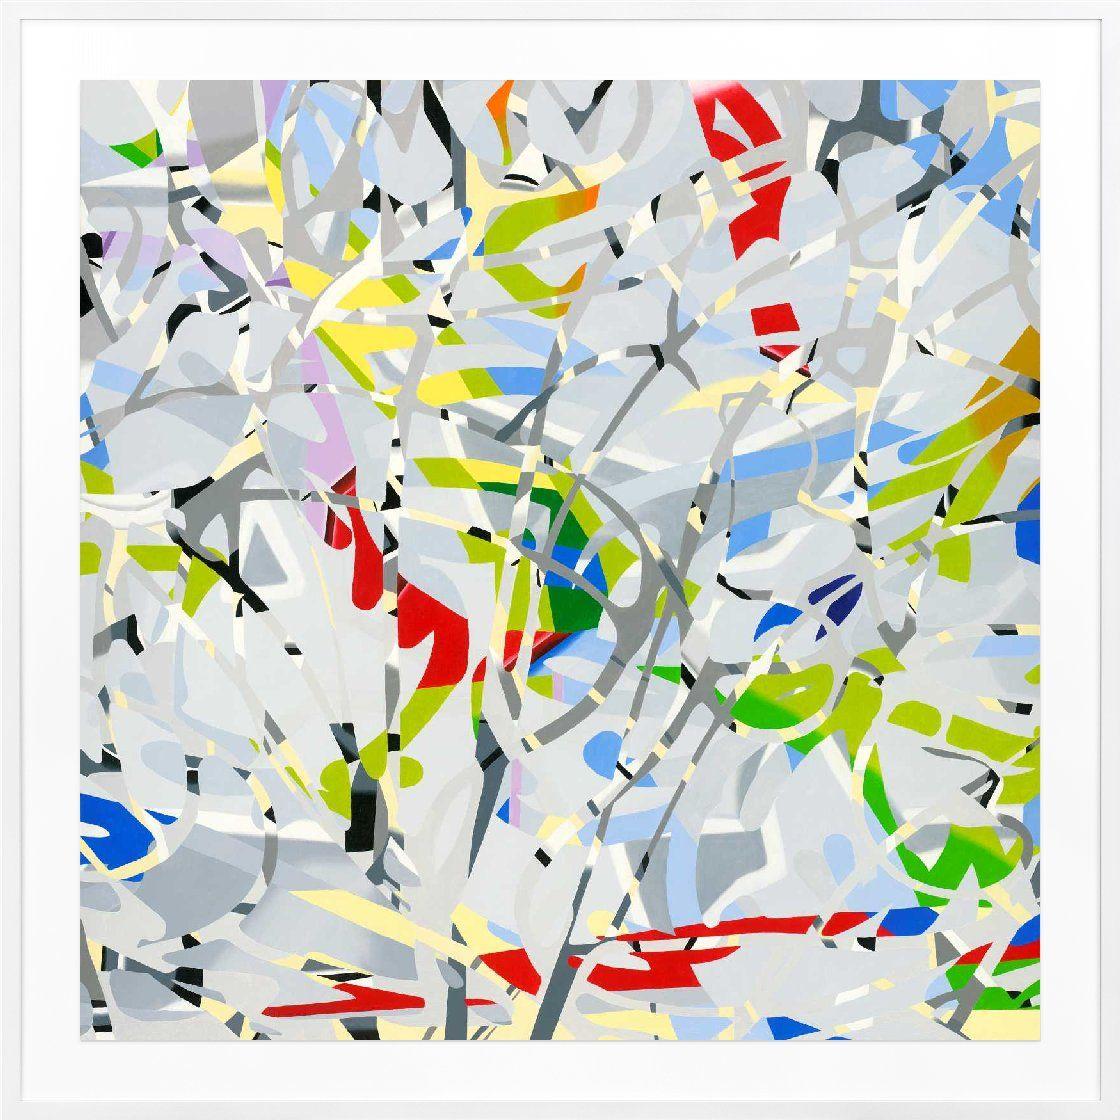 robert brinker print 56 x 56 framed 1 610 office artwork